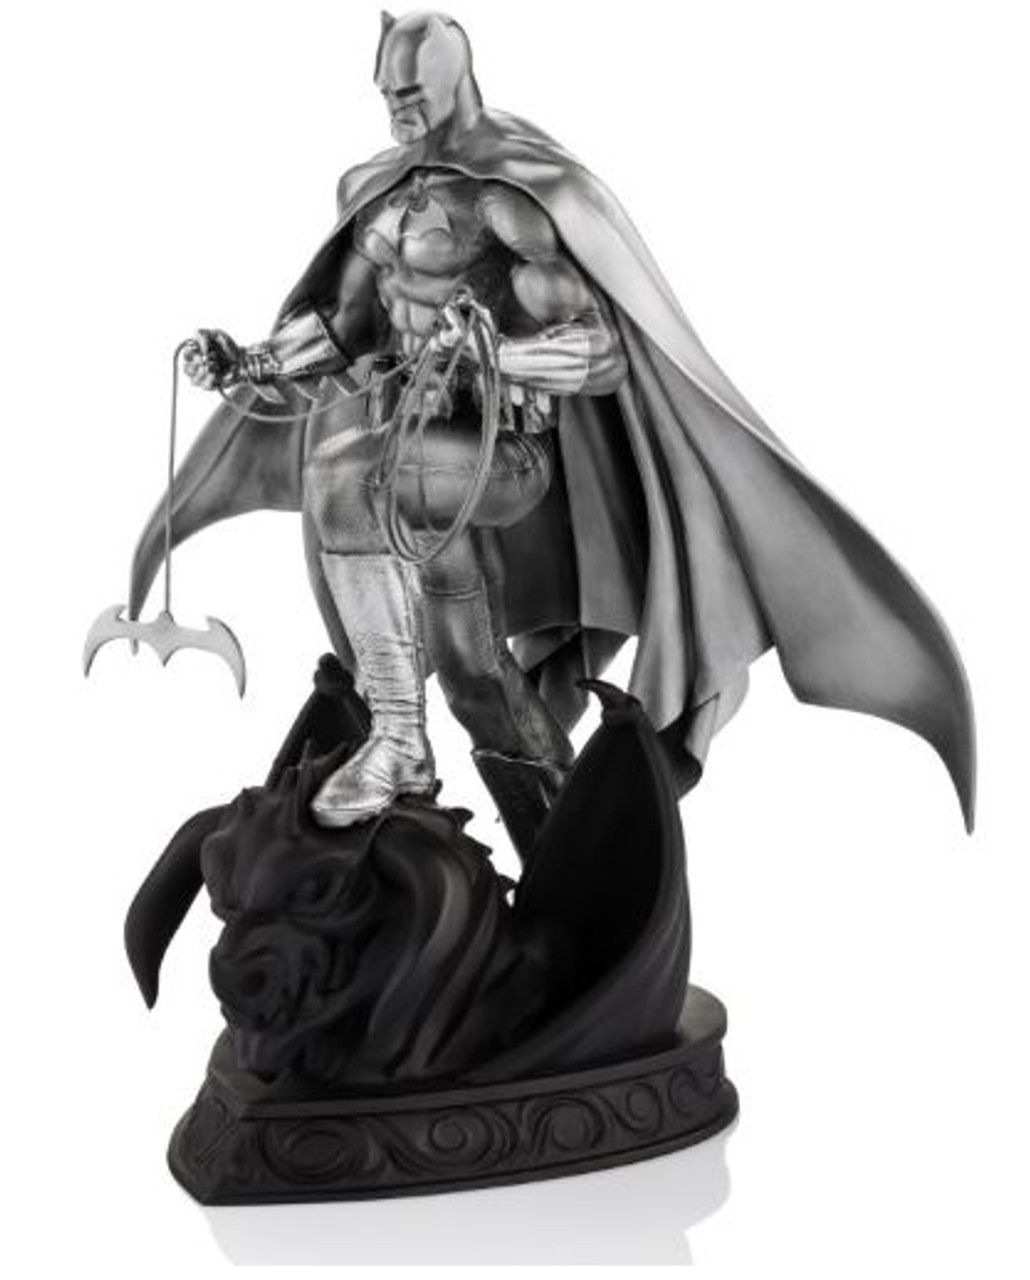 Batman Figurine (Limited Edition)